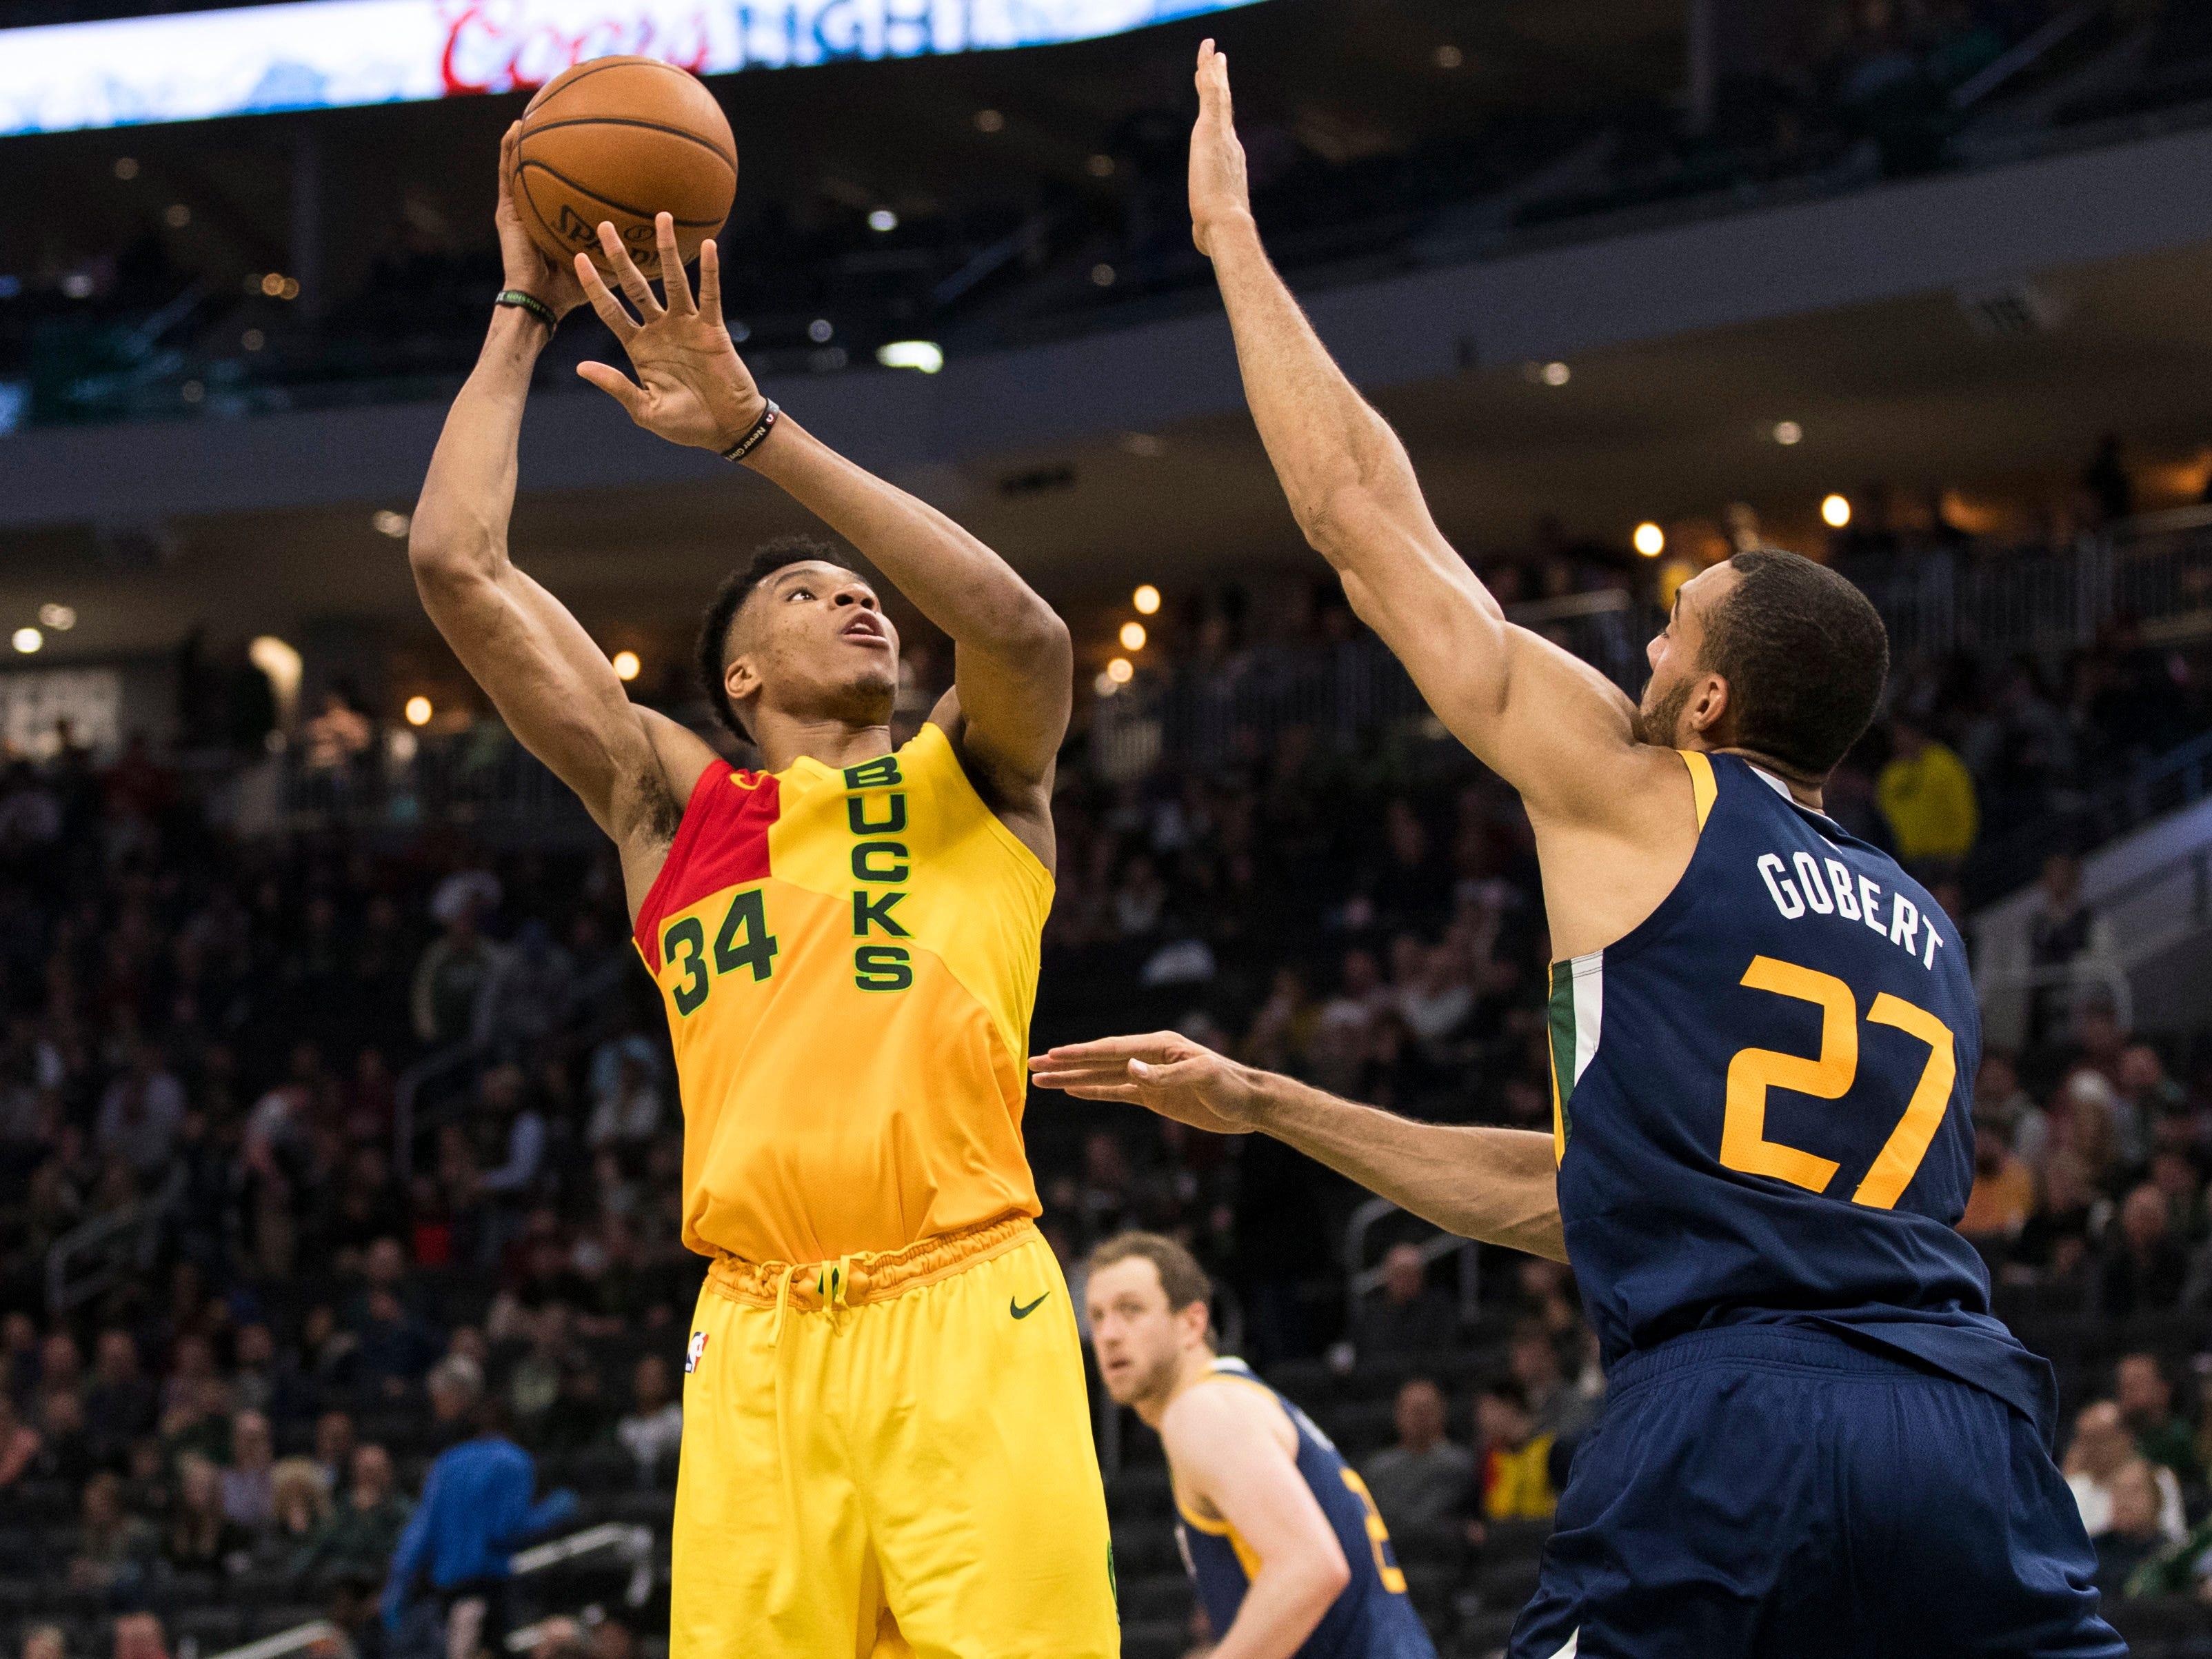 Bucks forward Giannis Antetokounmpo puts up a shot over Jazz center Rudy Gobert during the third quarter on Monday.